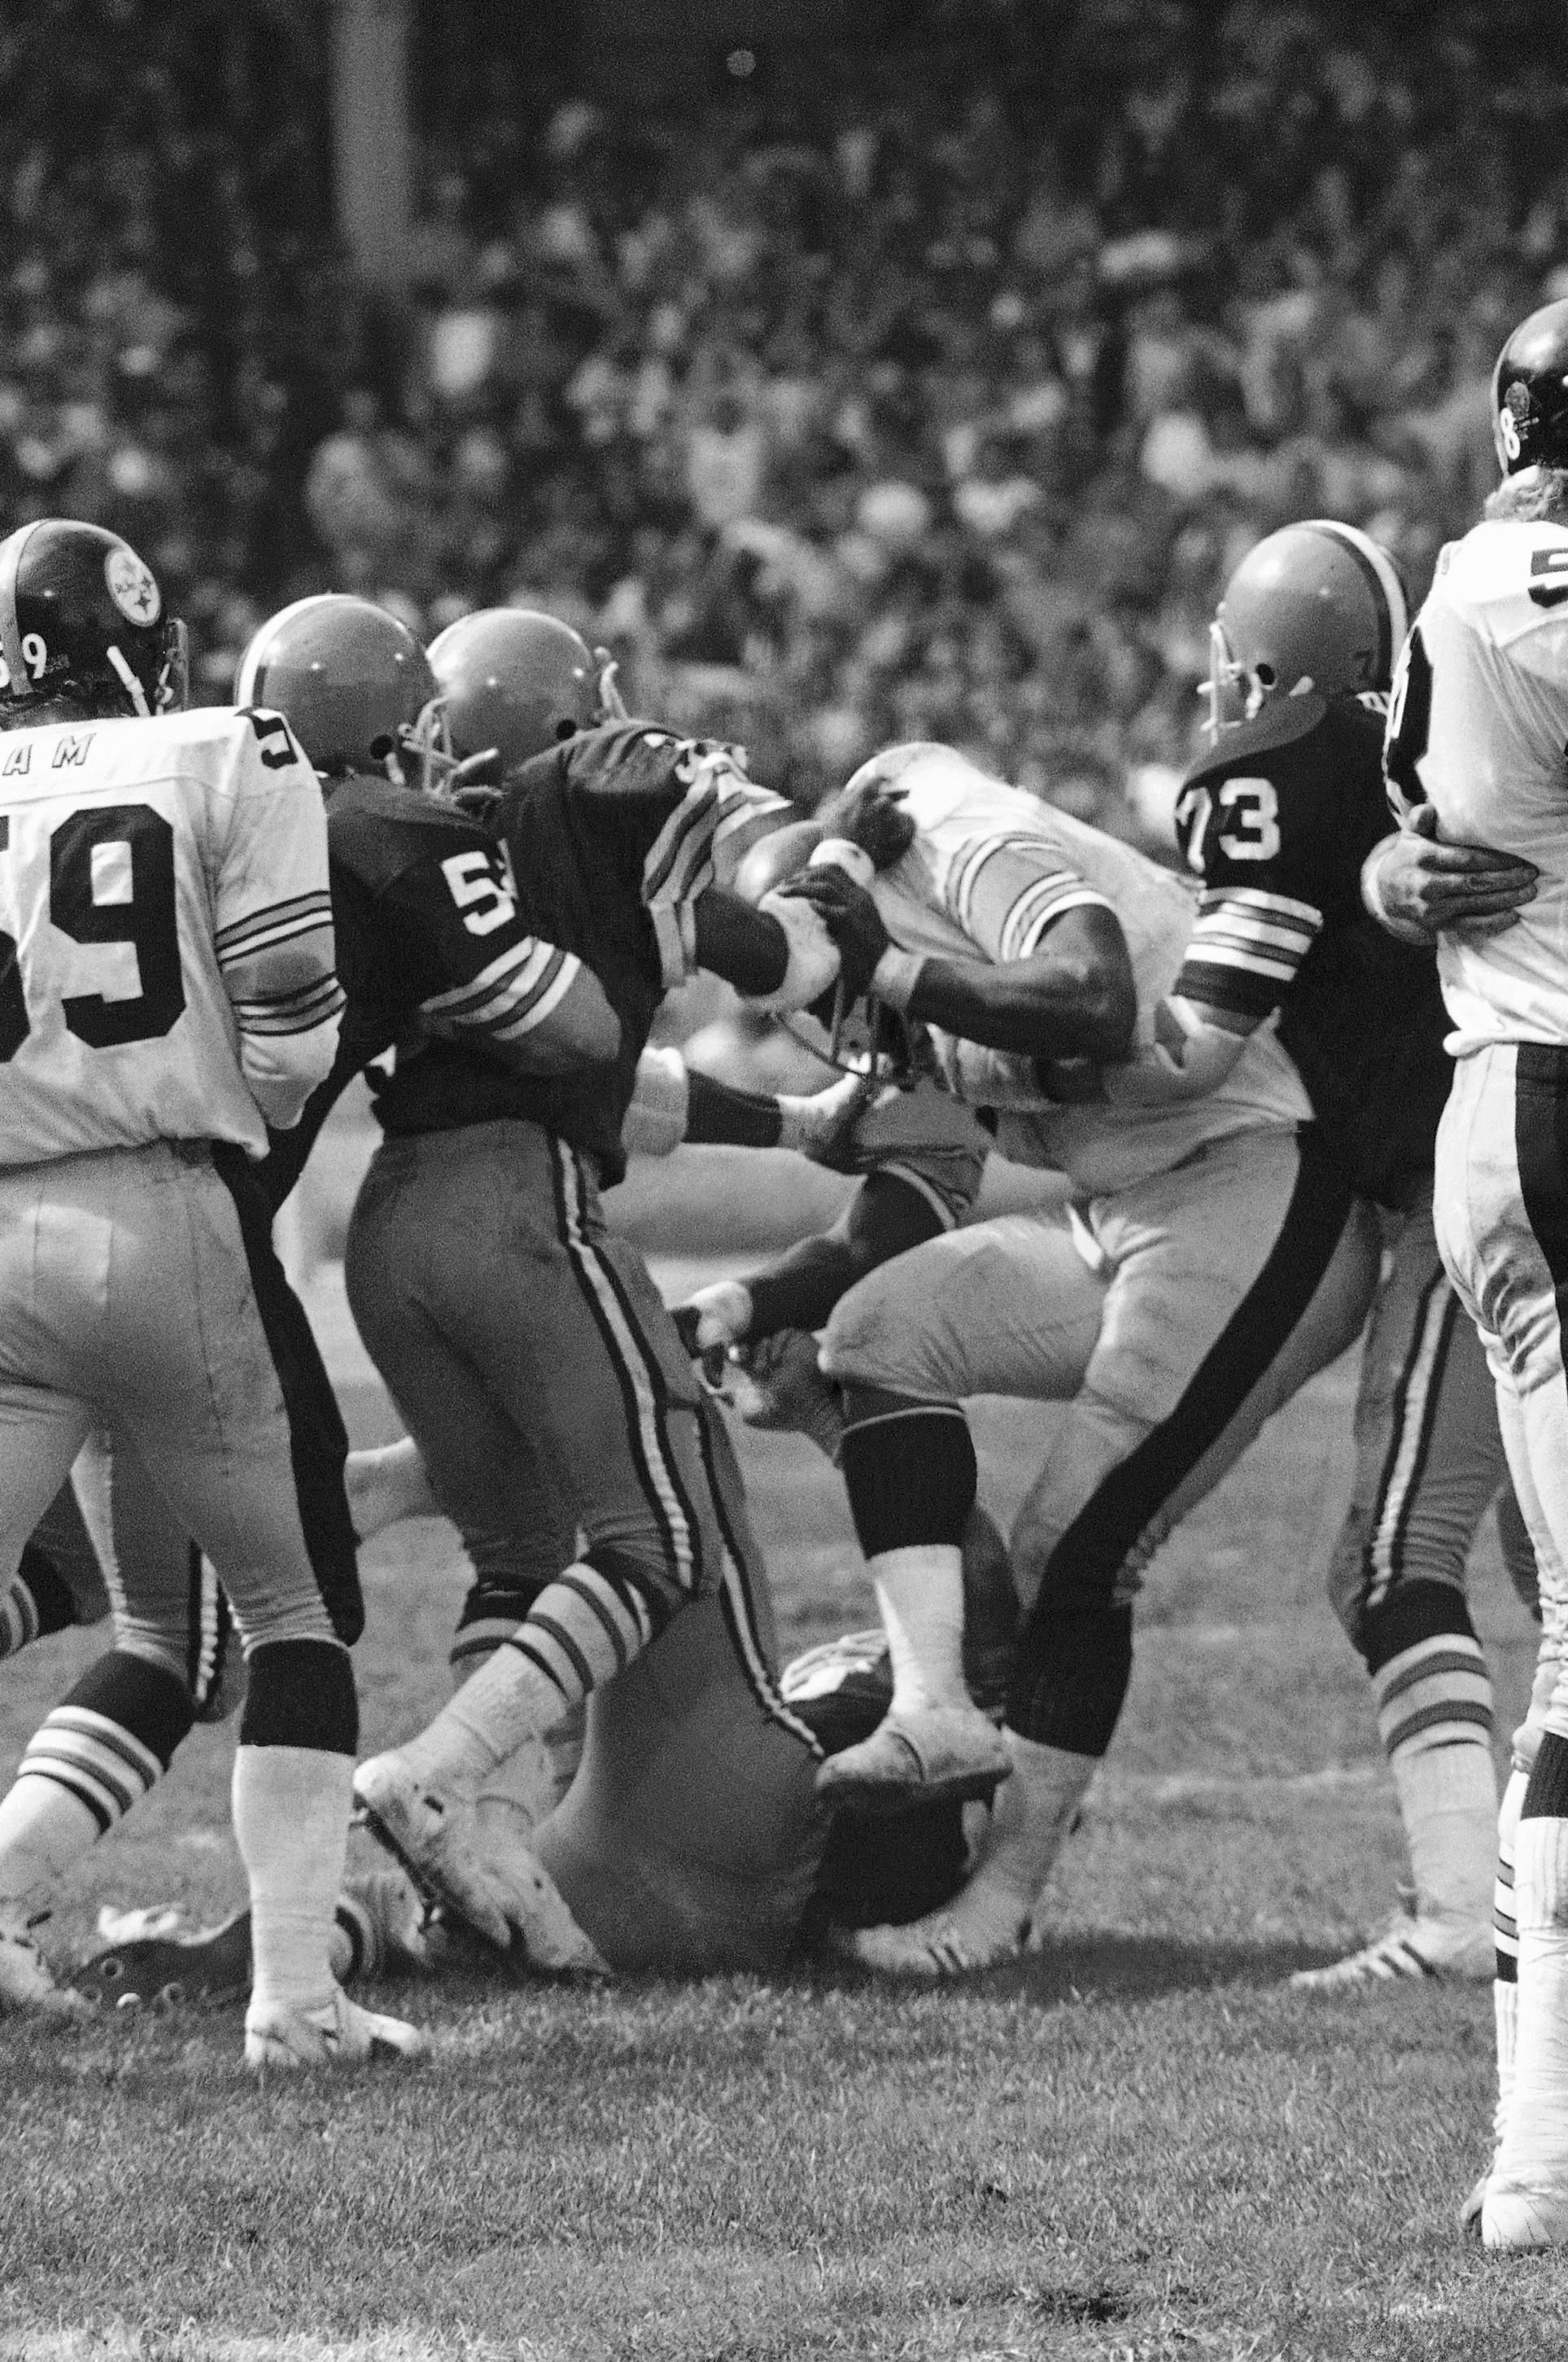 26b5a1c1d70 Pittsburgh Steelers' defensive tackle Mean Joe Greene kicks Cleveland  Browns' guard Bob McKay in the groin